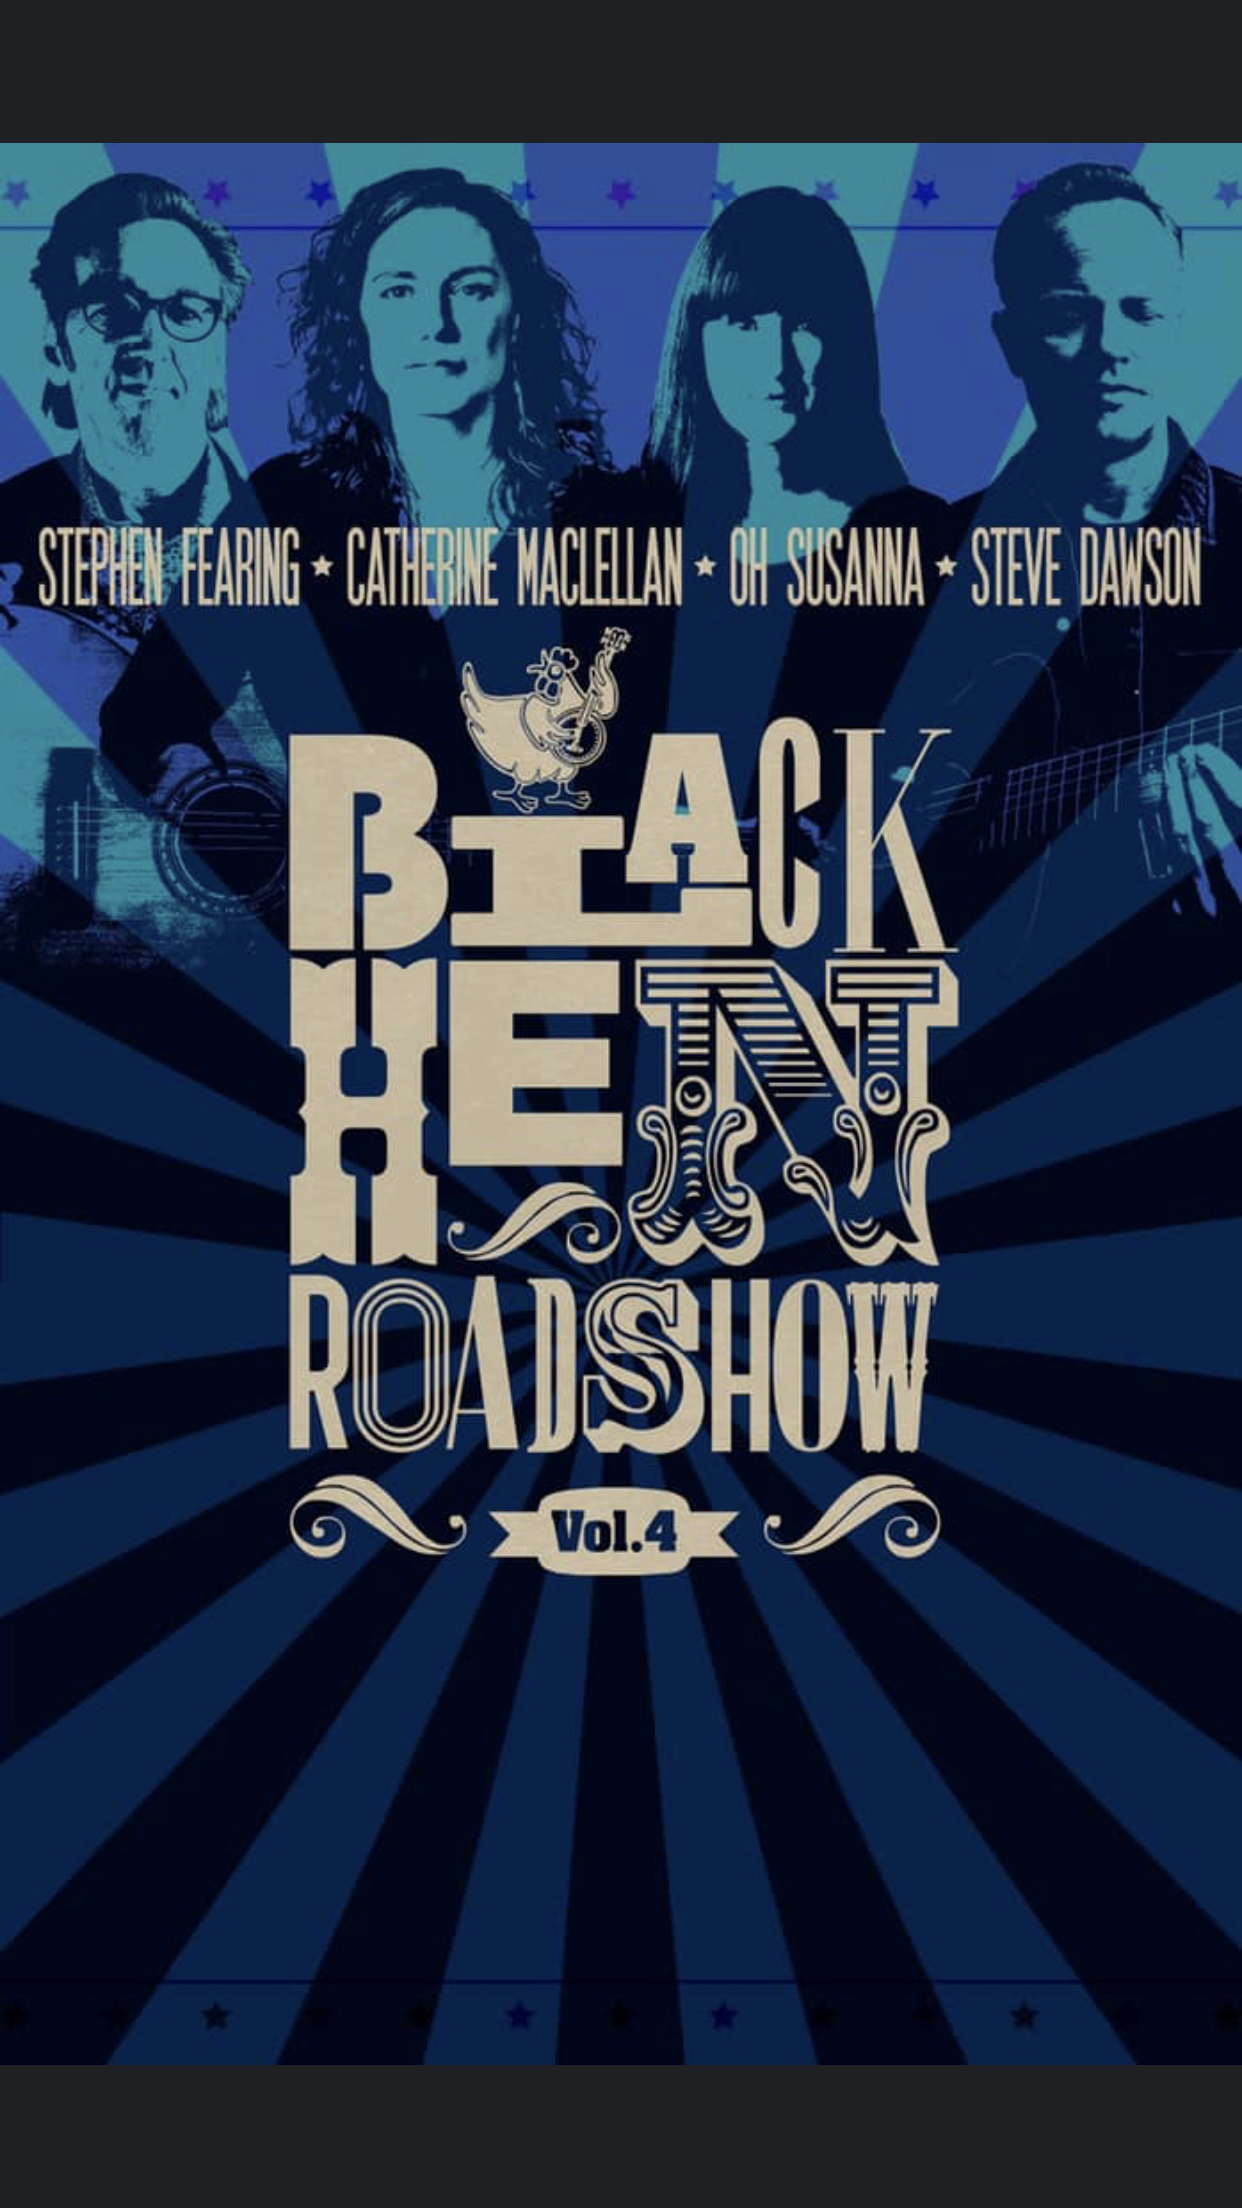 The Black Hen Roadshow Vol. 4